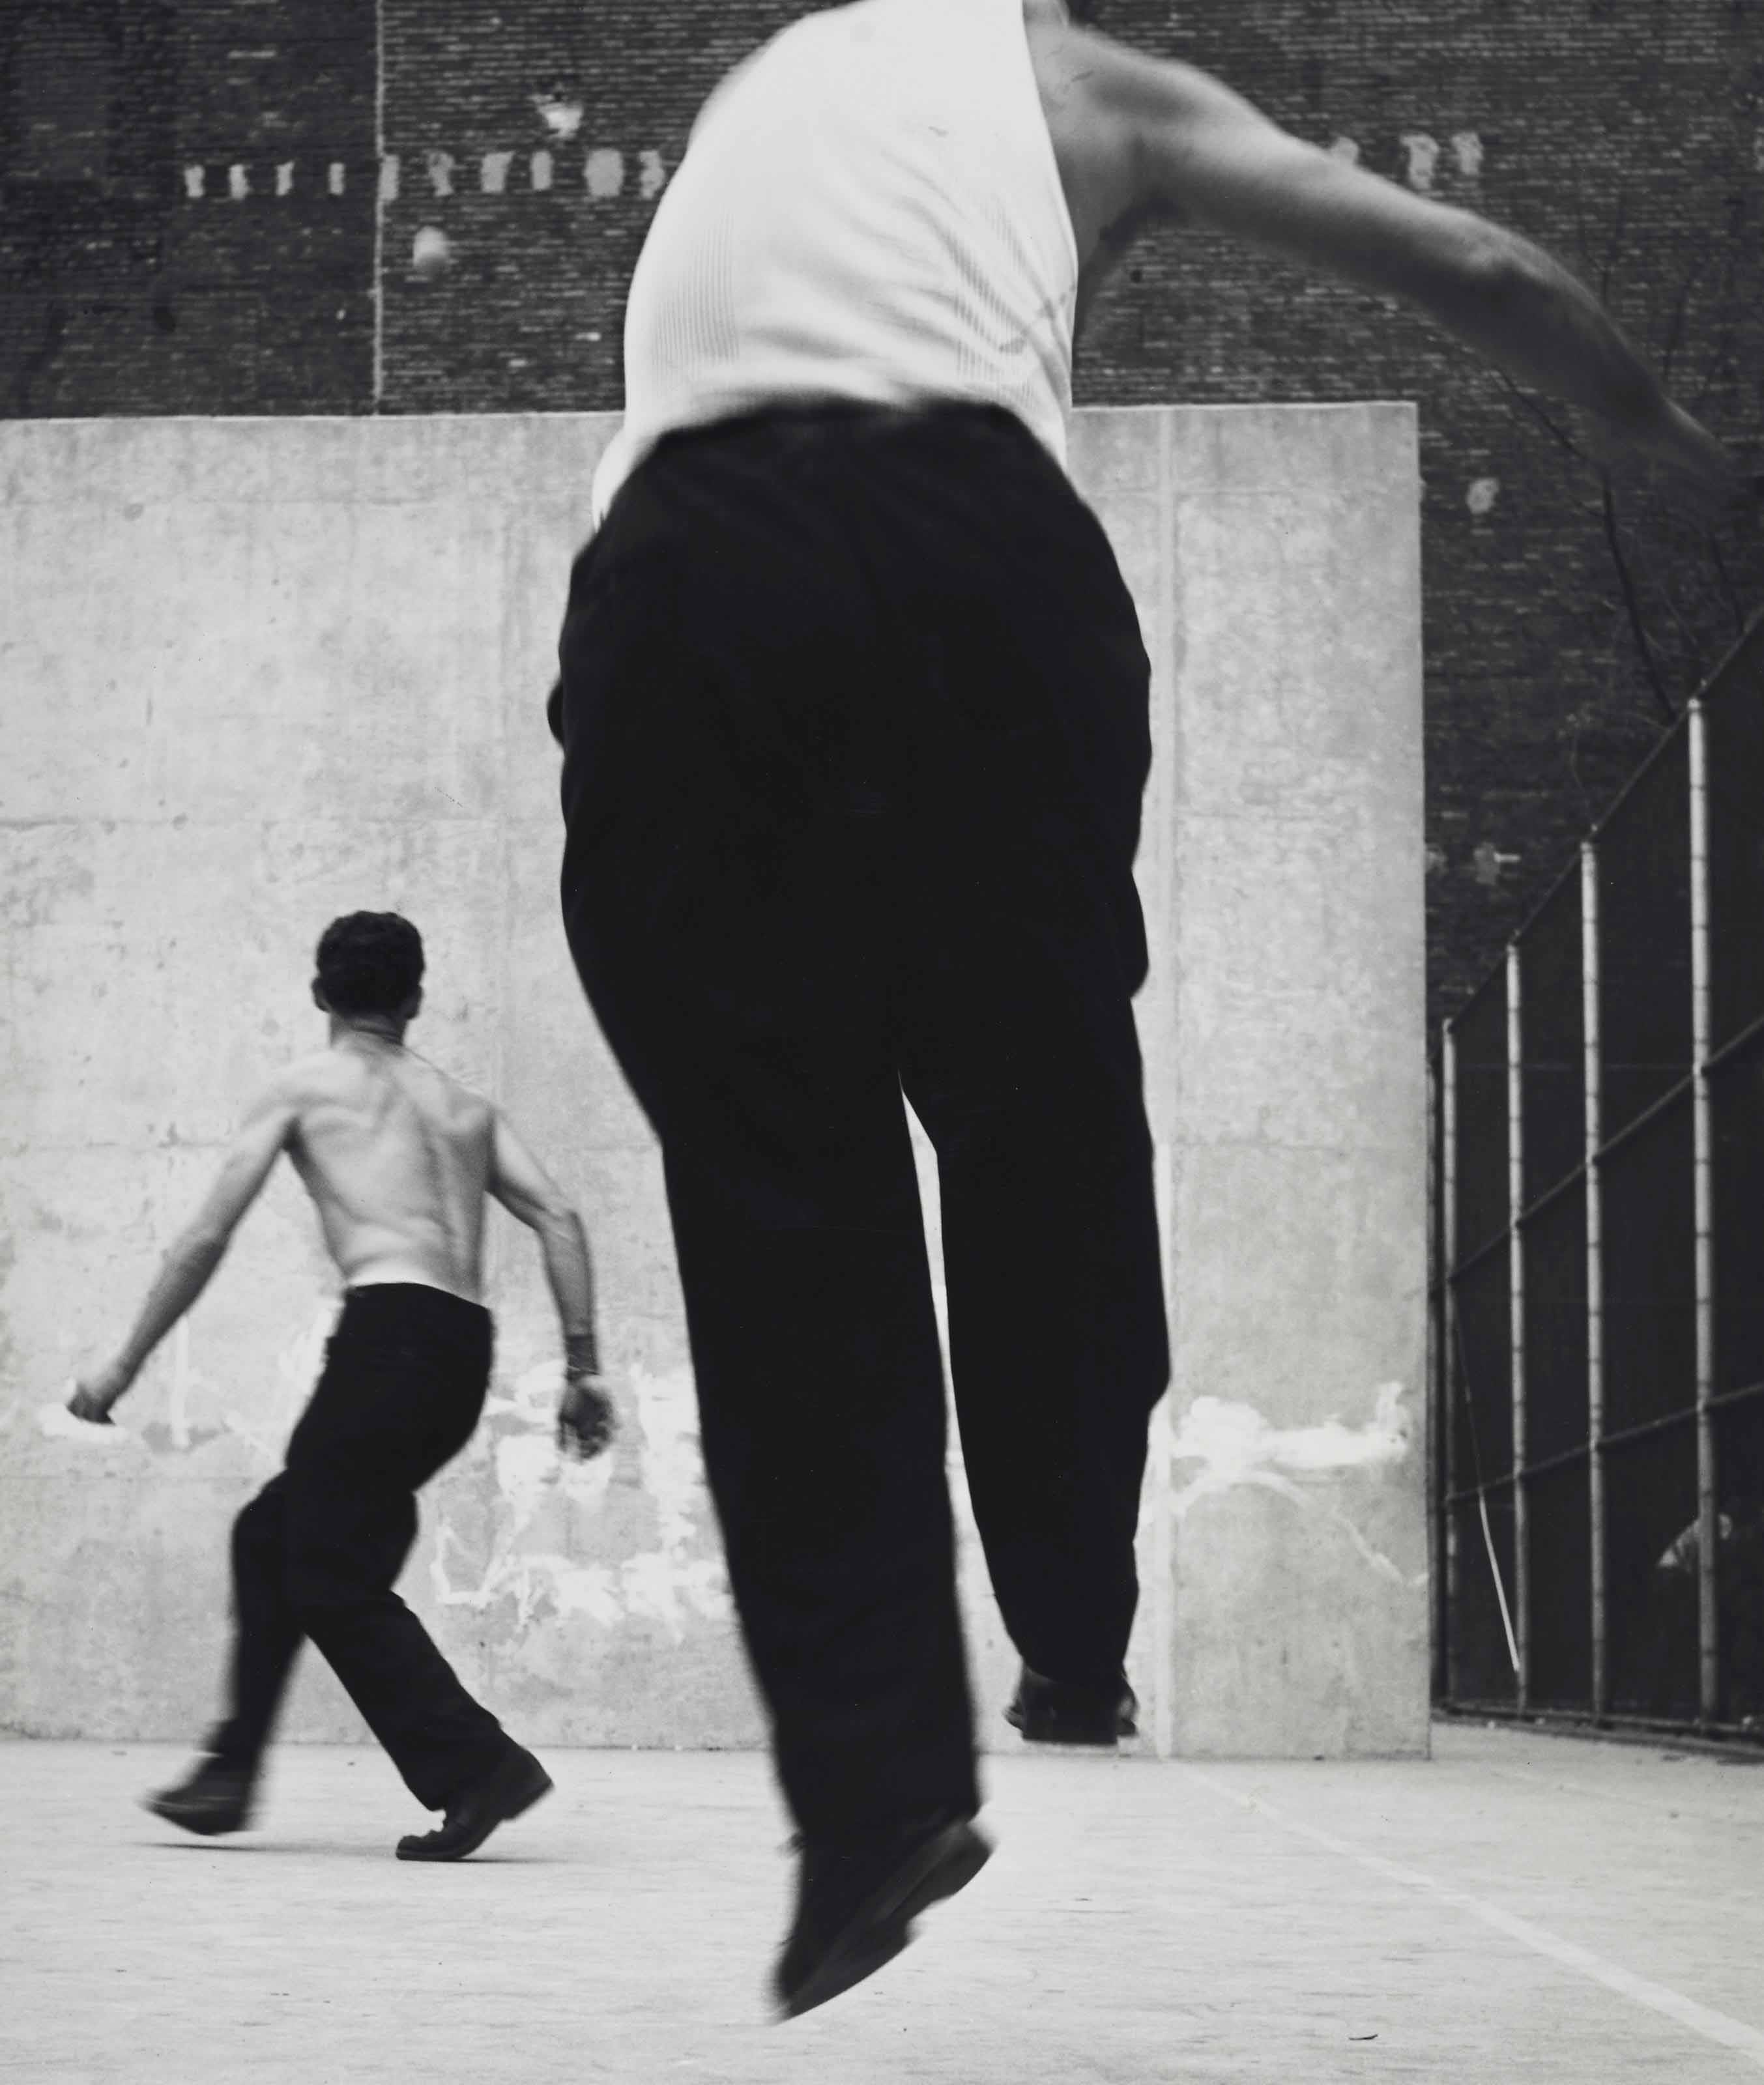 Handball Players, Houston Street, New York, 1969